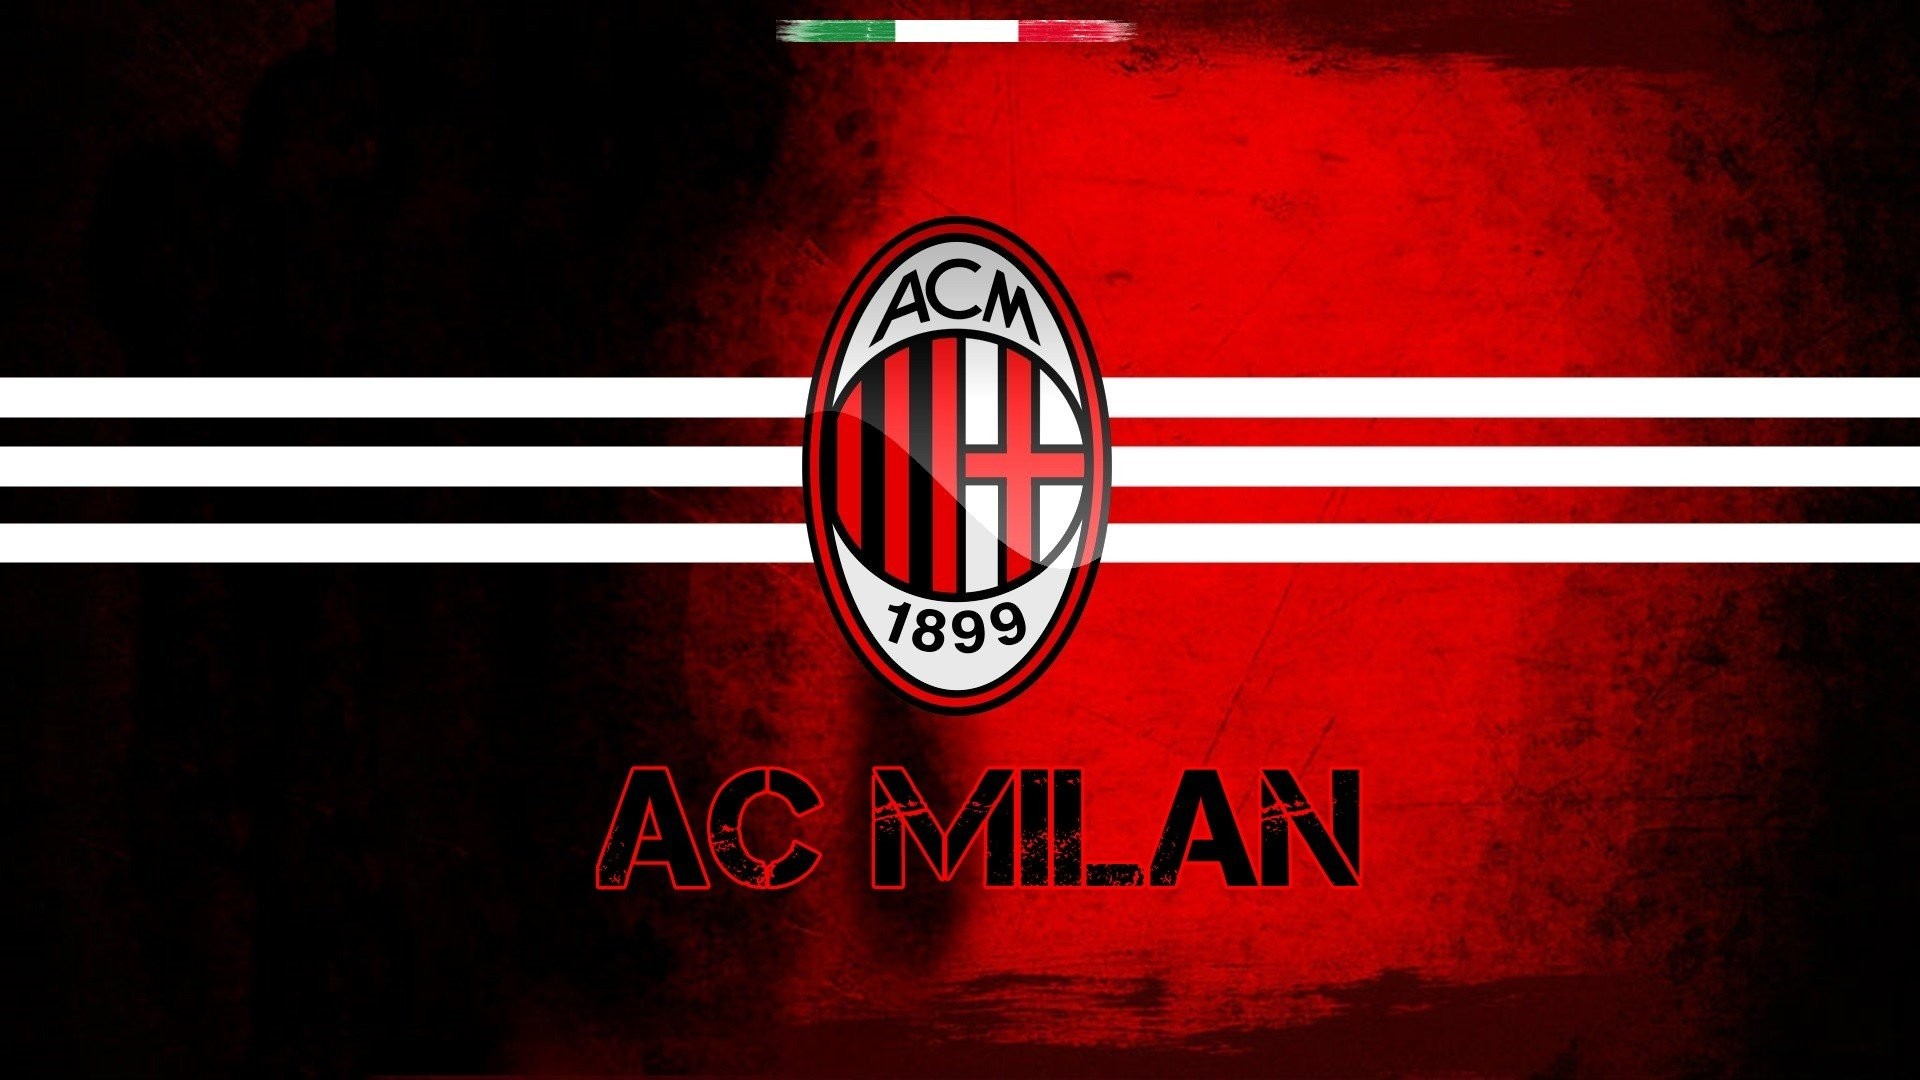 AC Milan Sports Football Club Italy Soccer